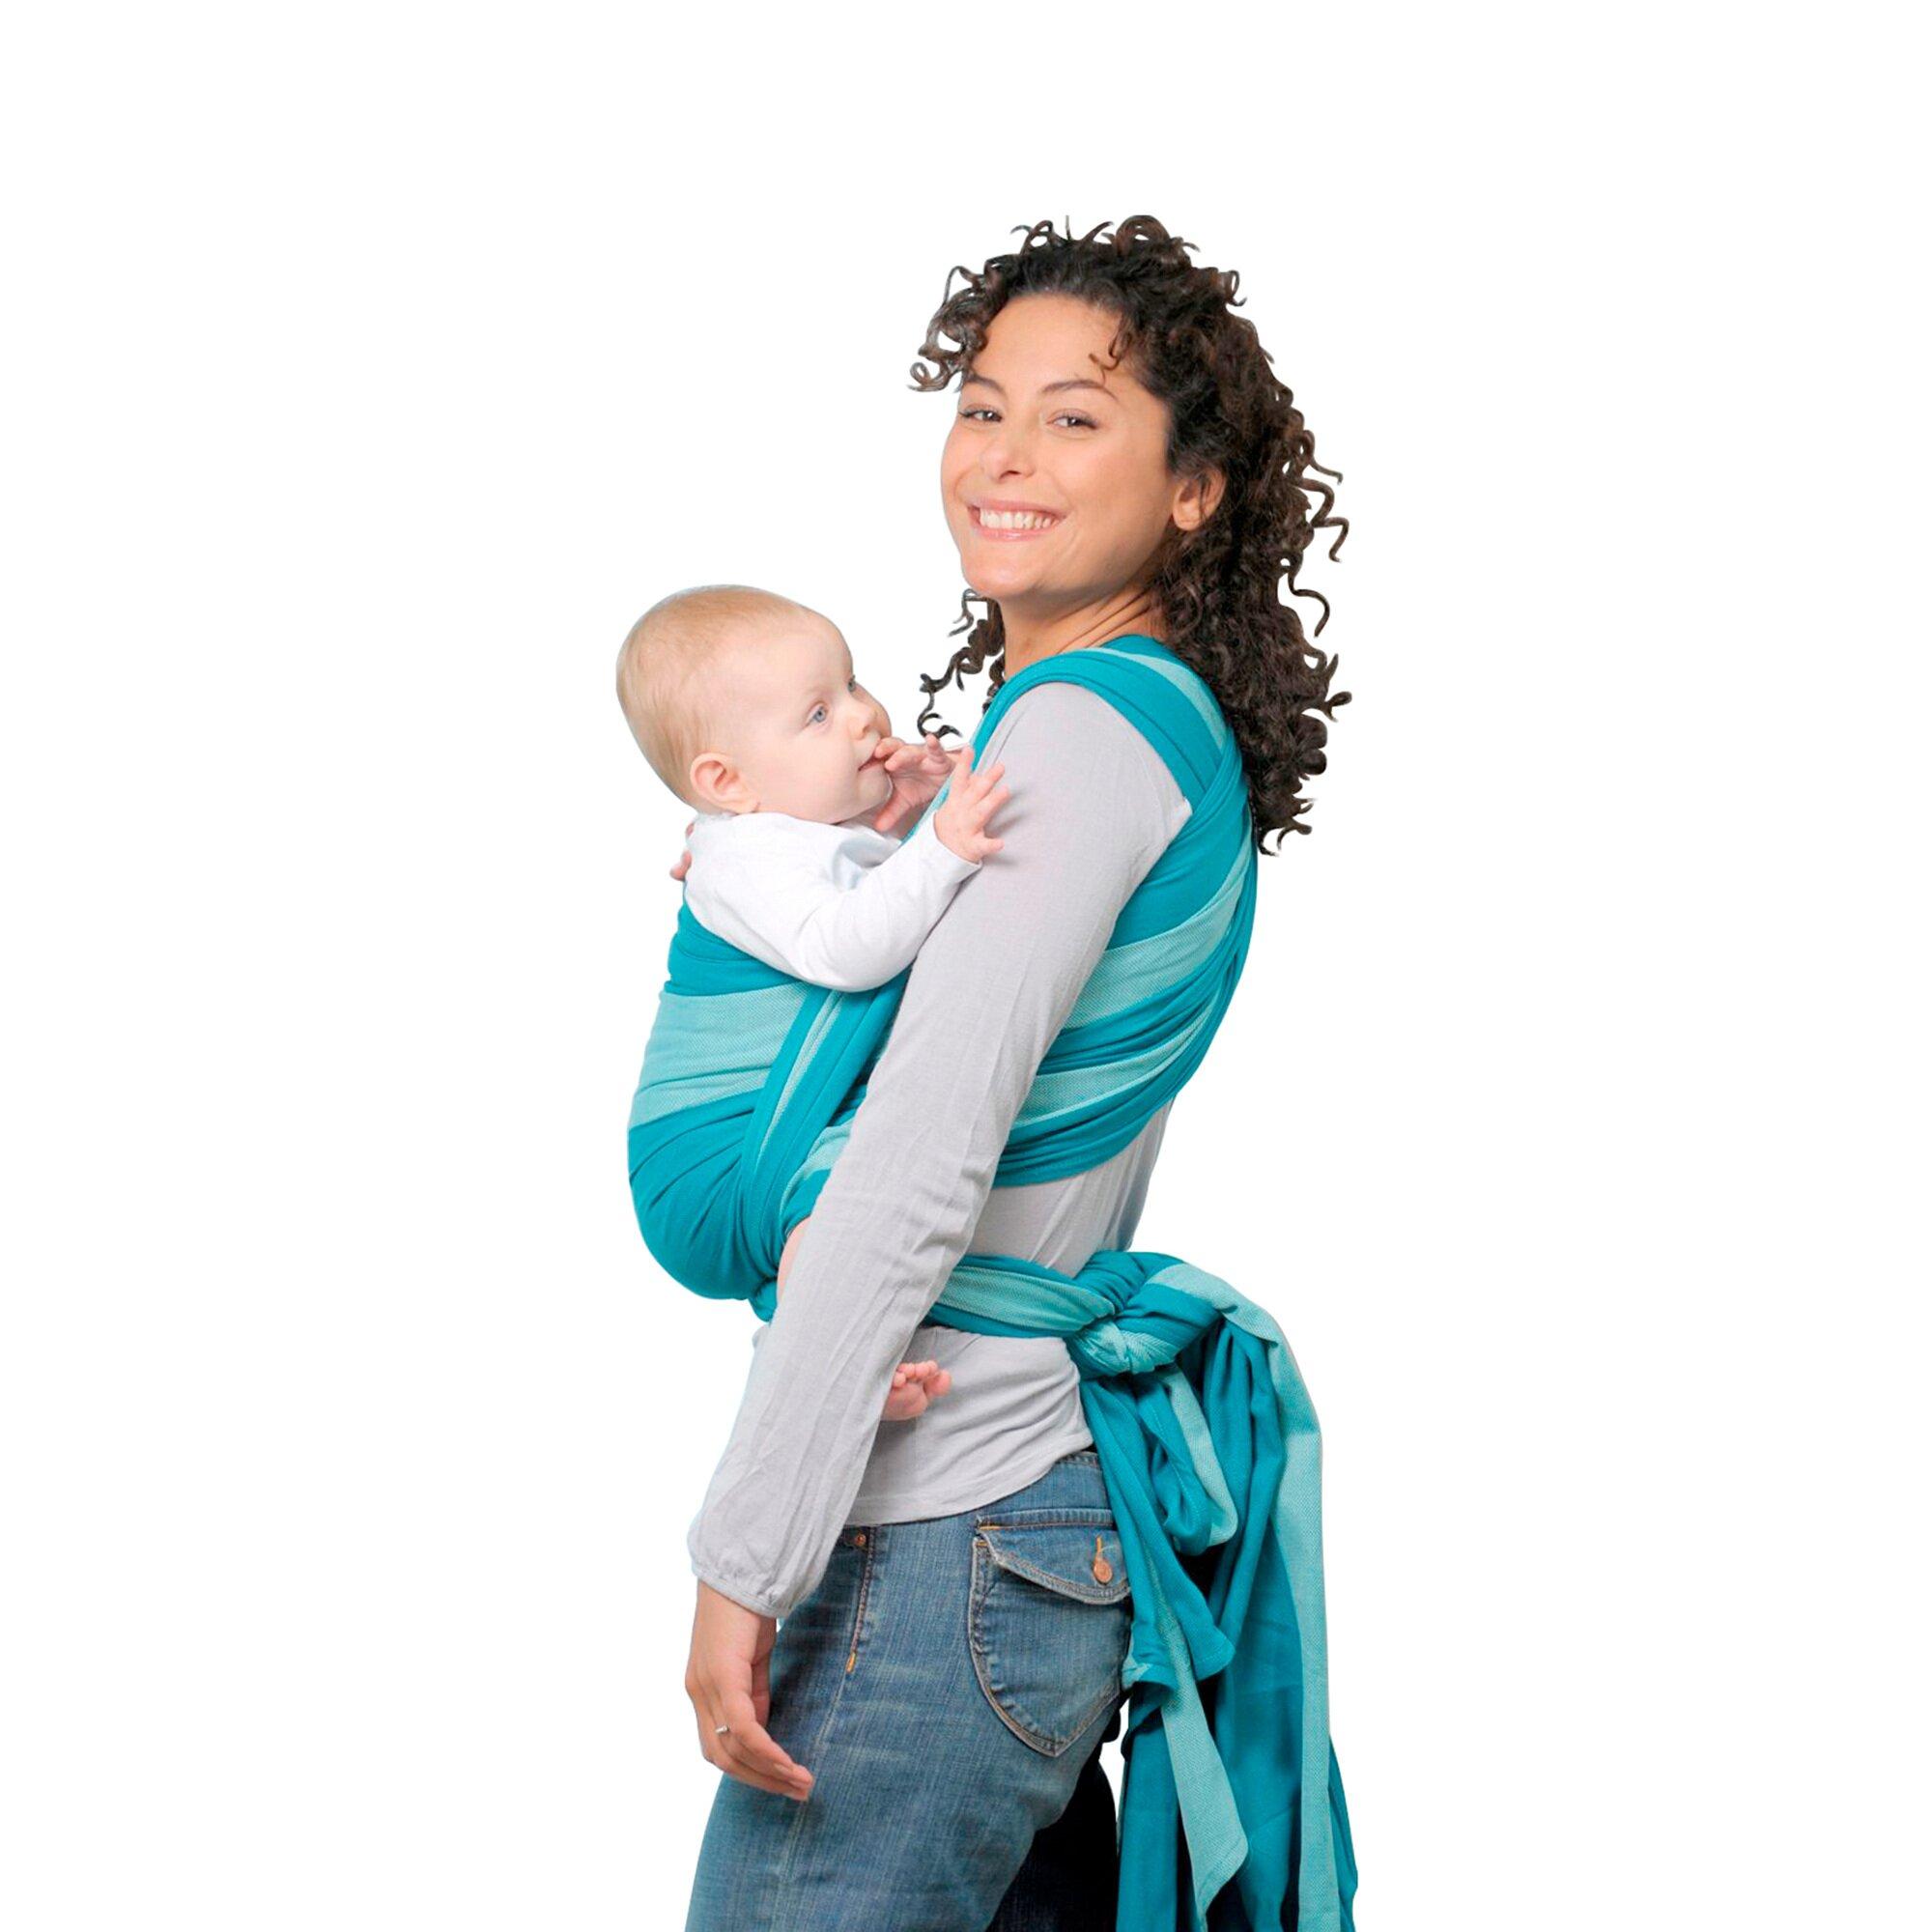 amazonas-babytragetuch-carry-sling-gruen